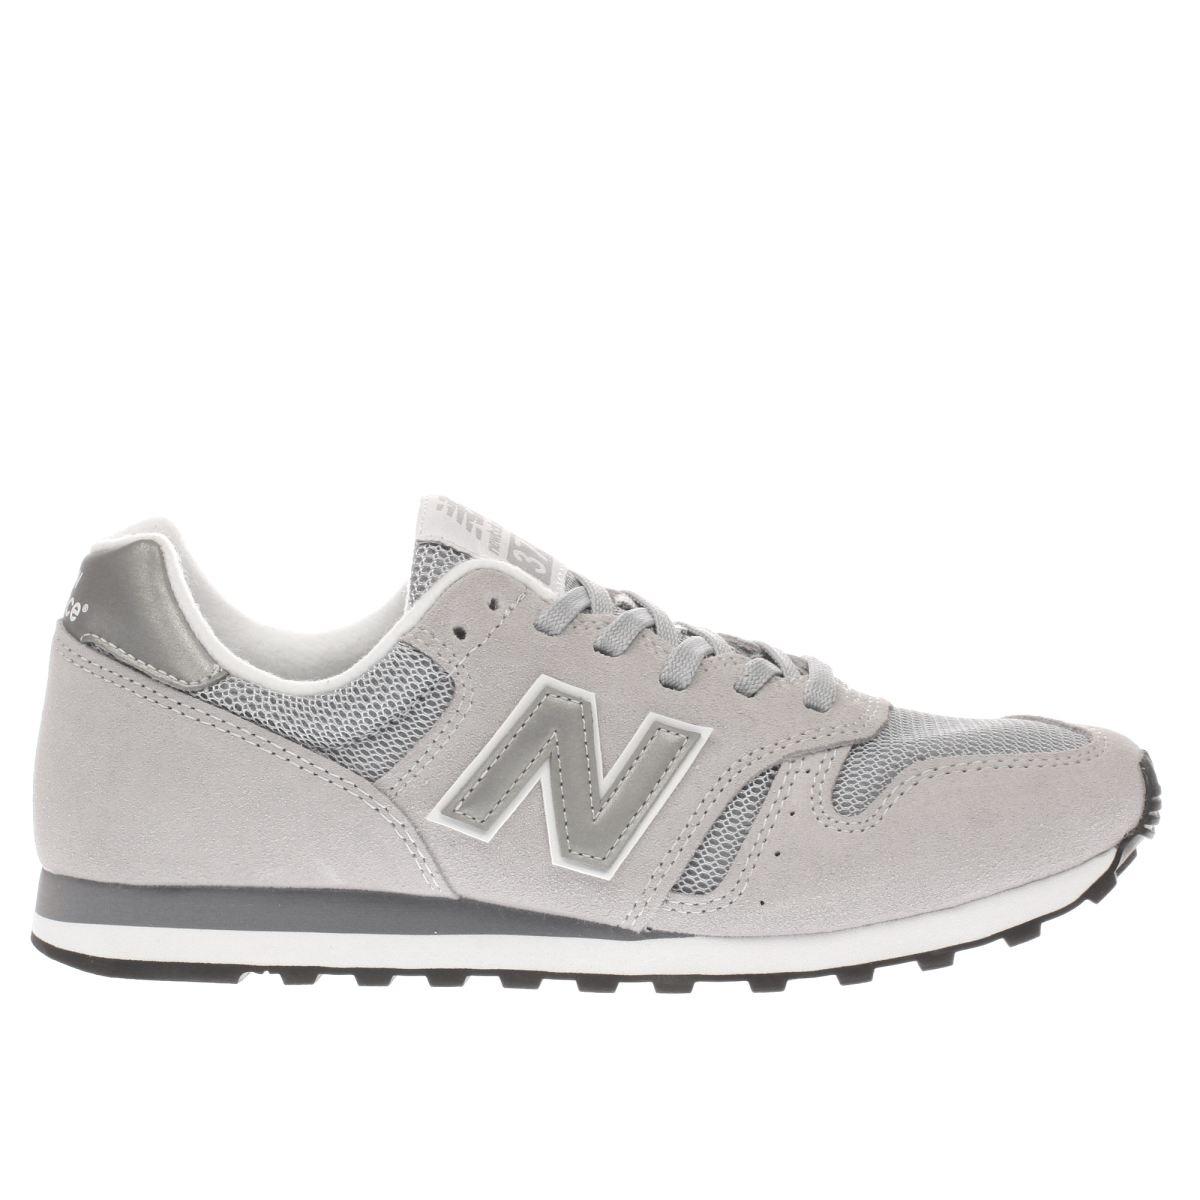 new balance grey 373 trainers